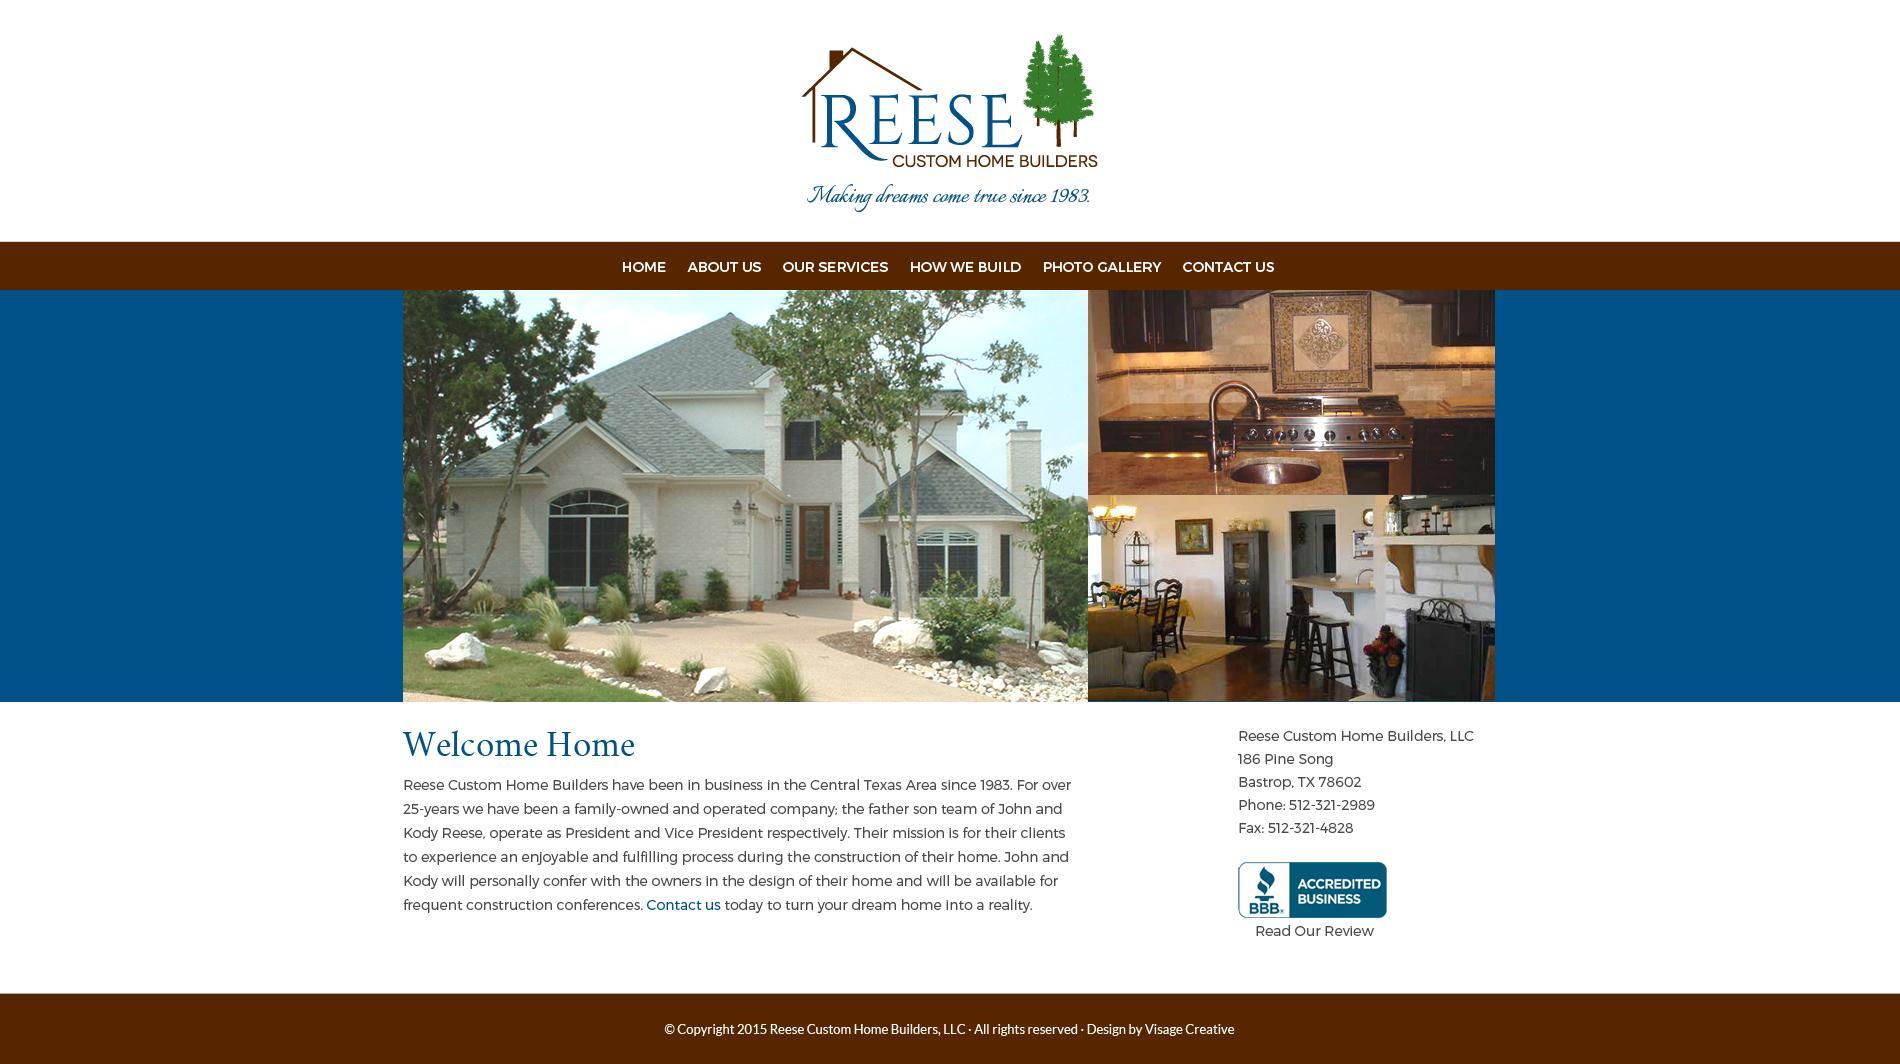 reese-web-mockup1